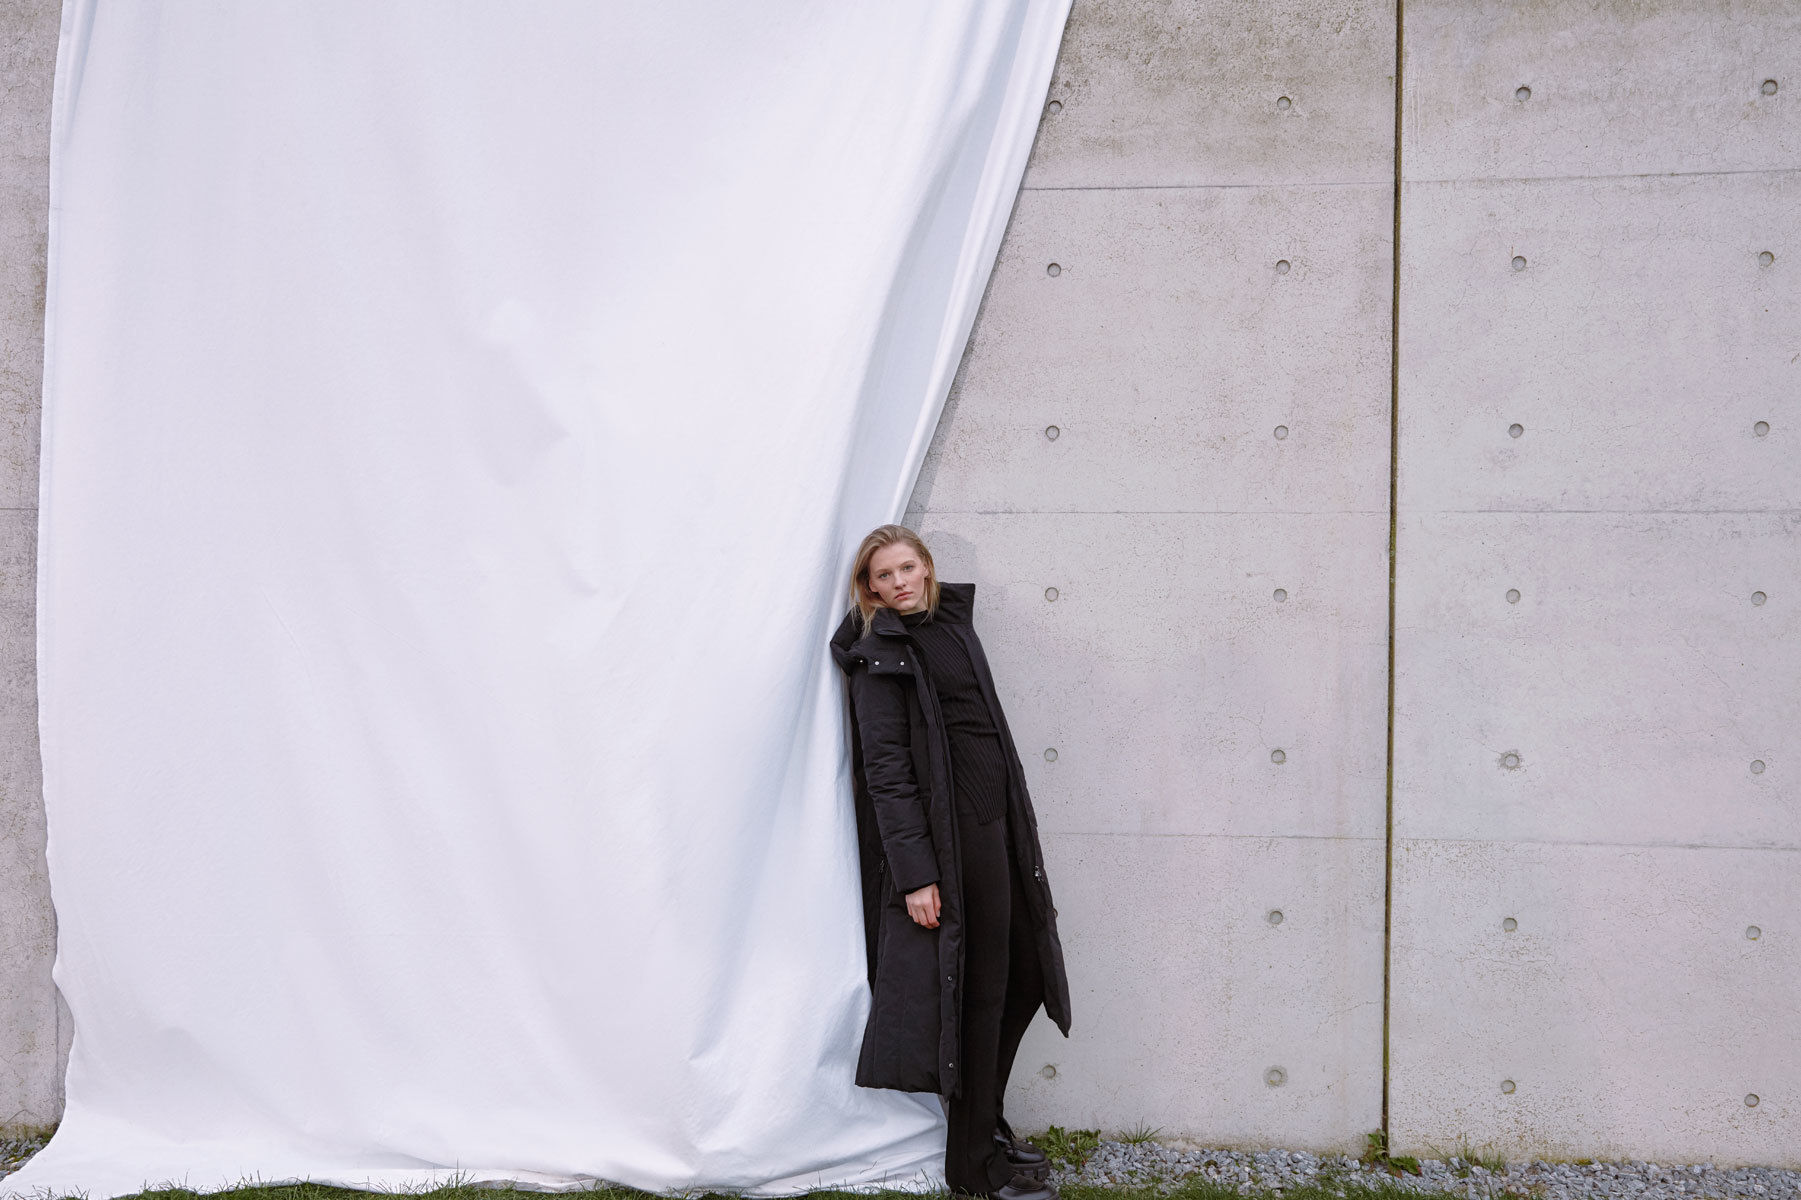 NINA KLEIN - Elke Dostal - G-lab